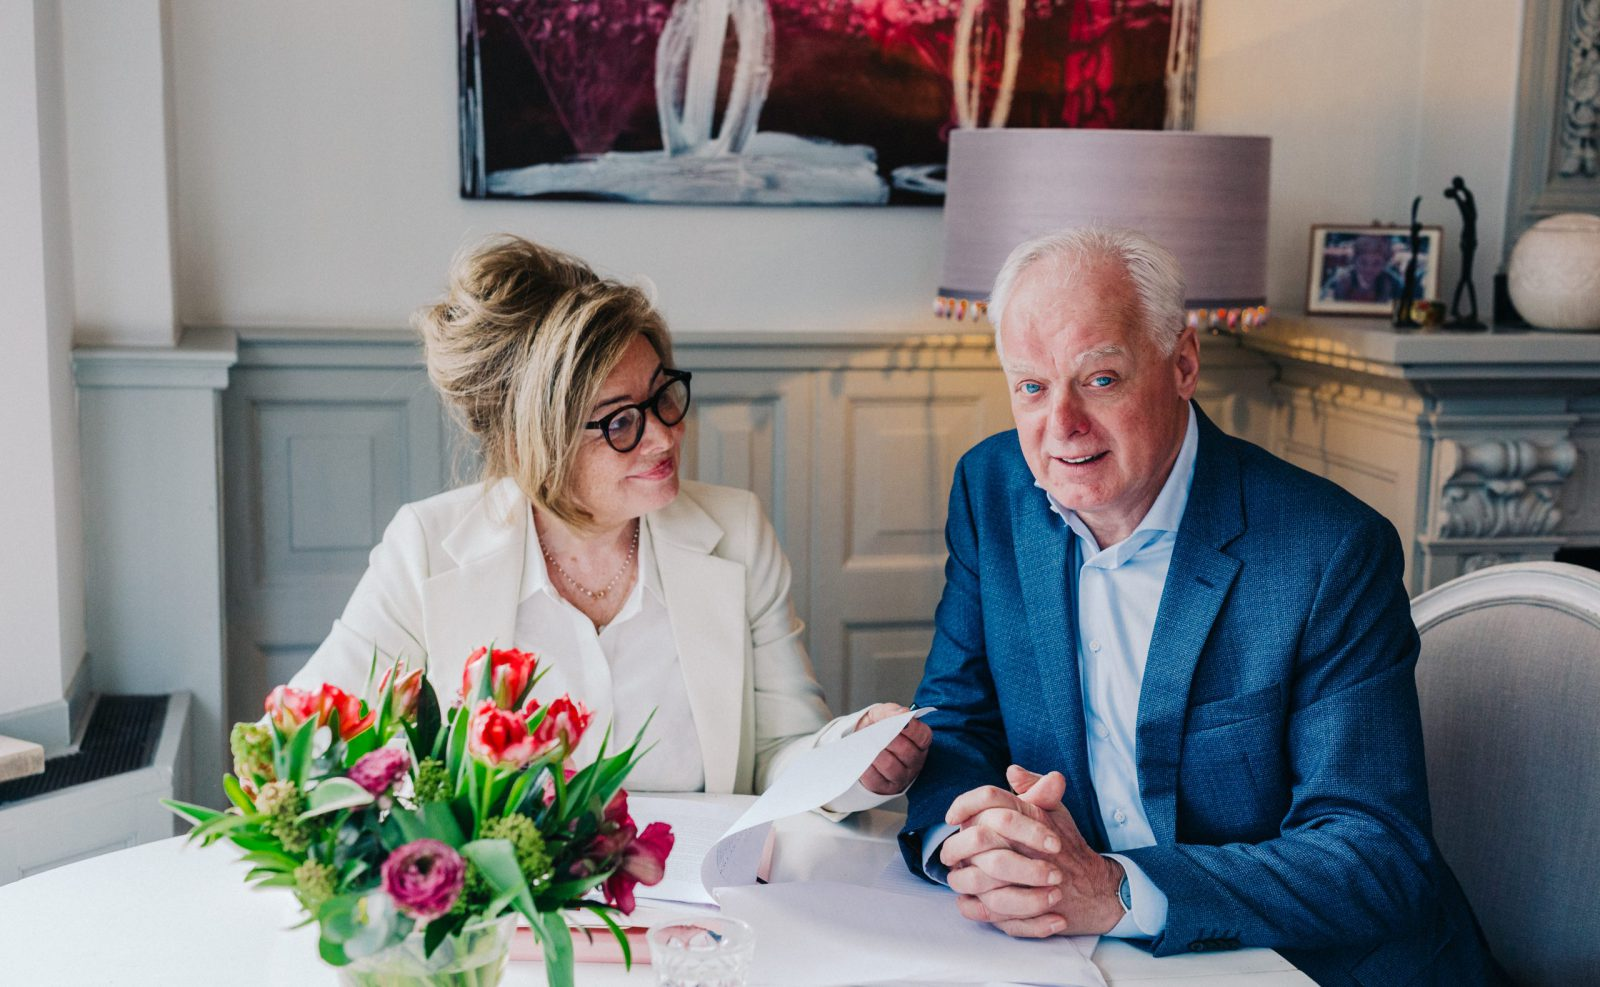 Annelies Verhoeff en René de Haas, advocaten en mediators